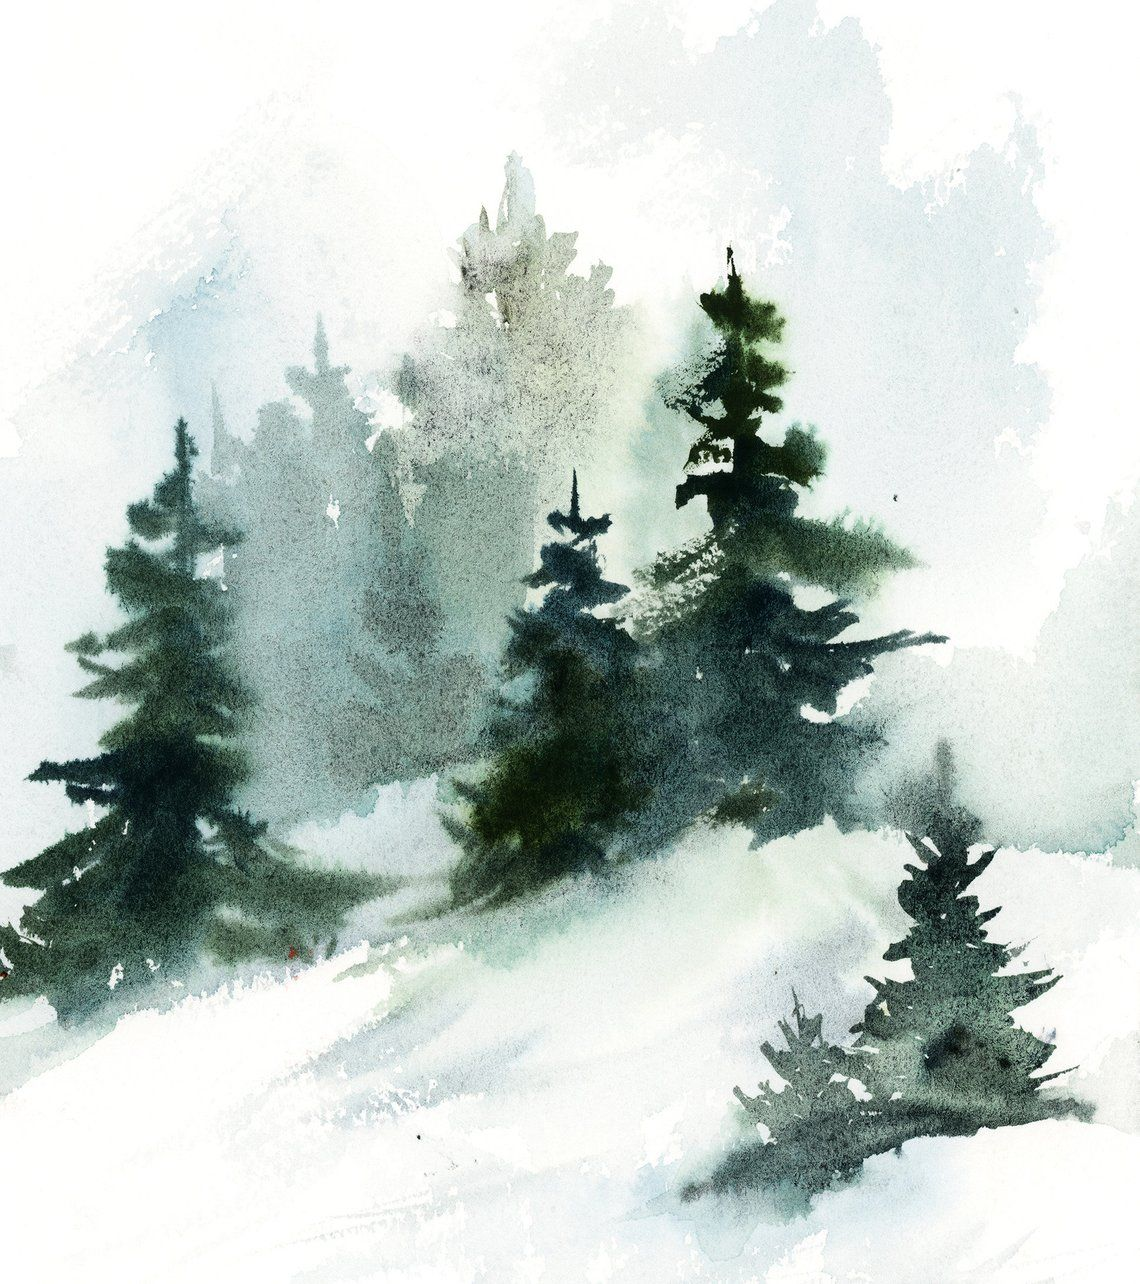 Pine Trees Landscape Painting Winter Landscape Original Watercolor Painting Snowy Nature Painting By Canotstop Nature Paintings Watercolor Trees Watercolor Landscape